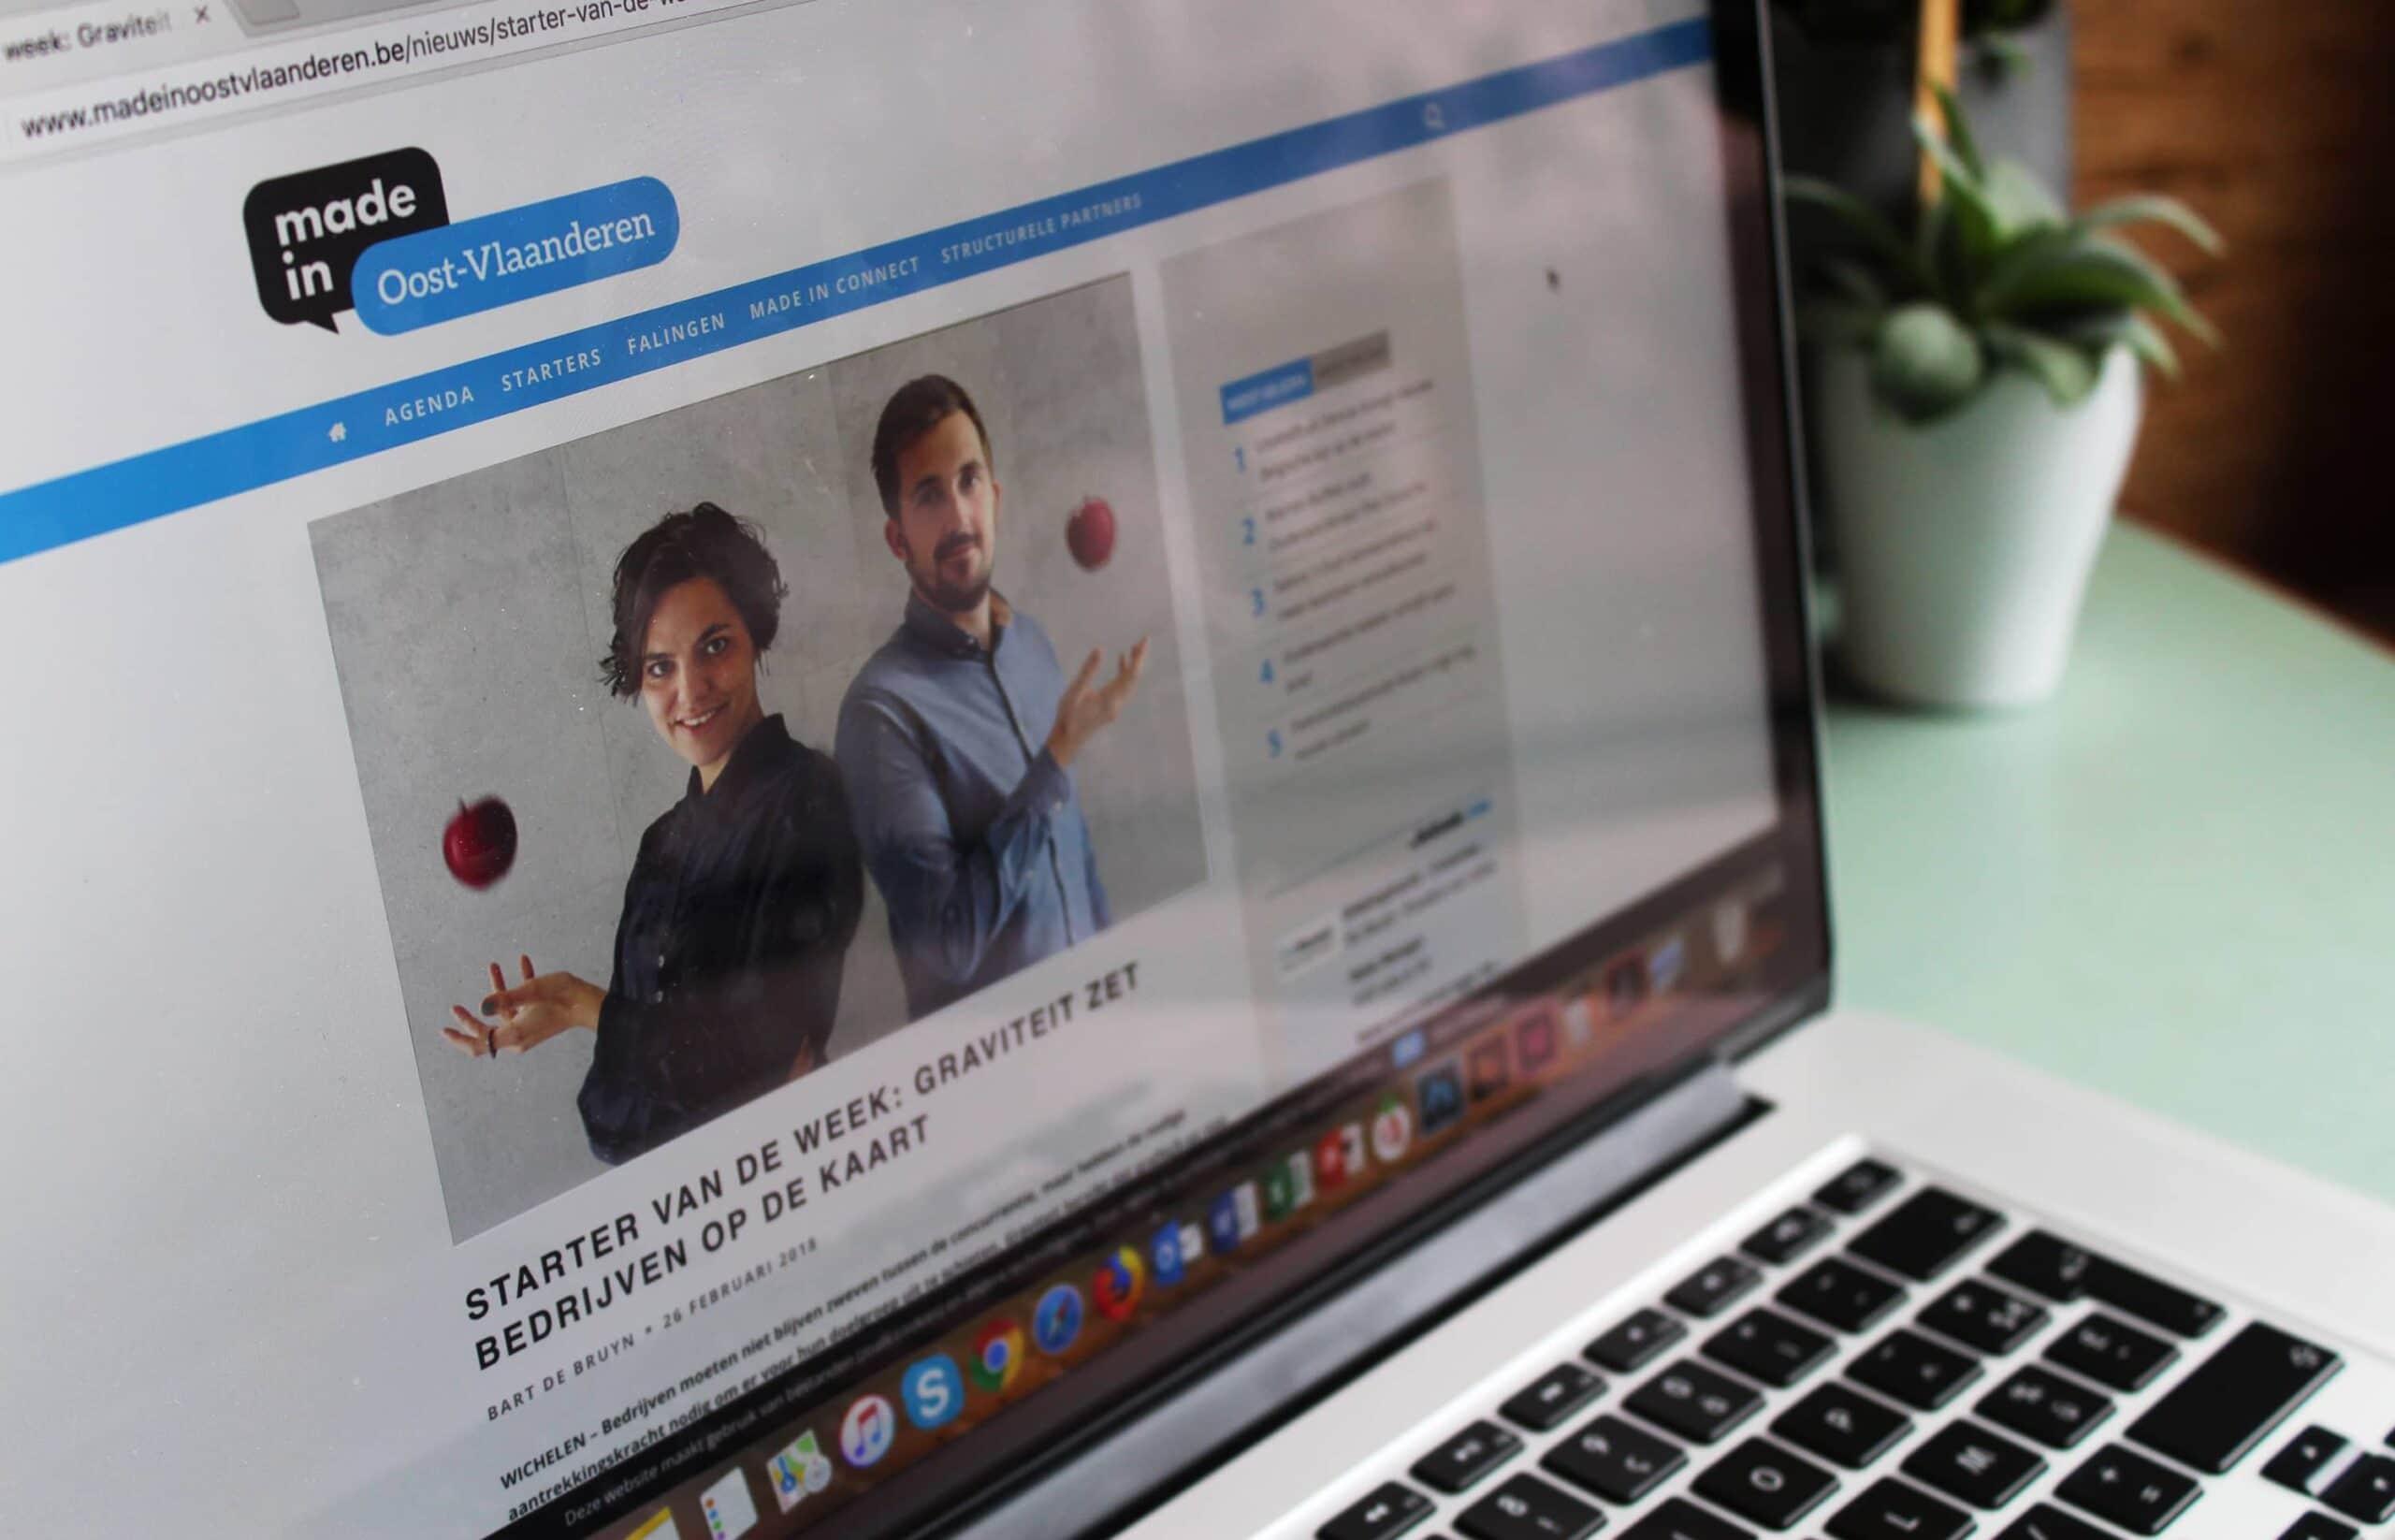 Graviteit Oost-Vlaams communicatiebureau